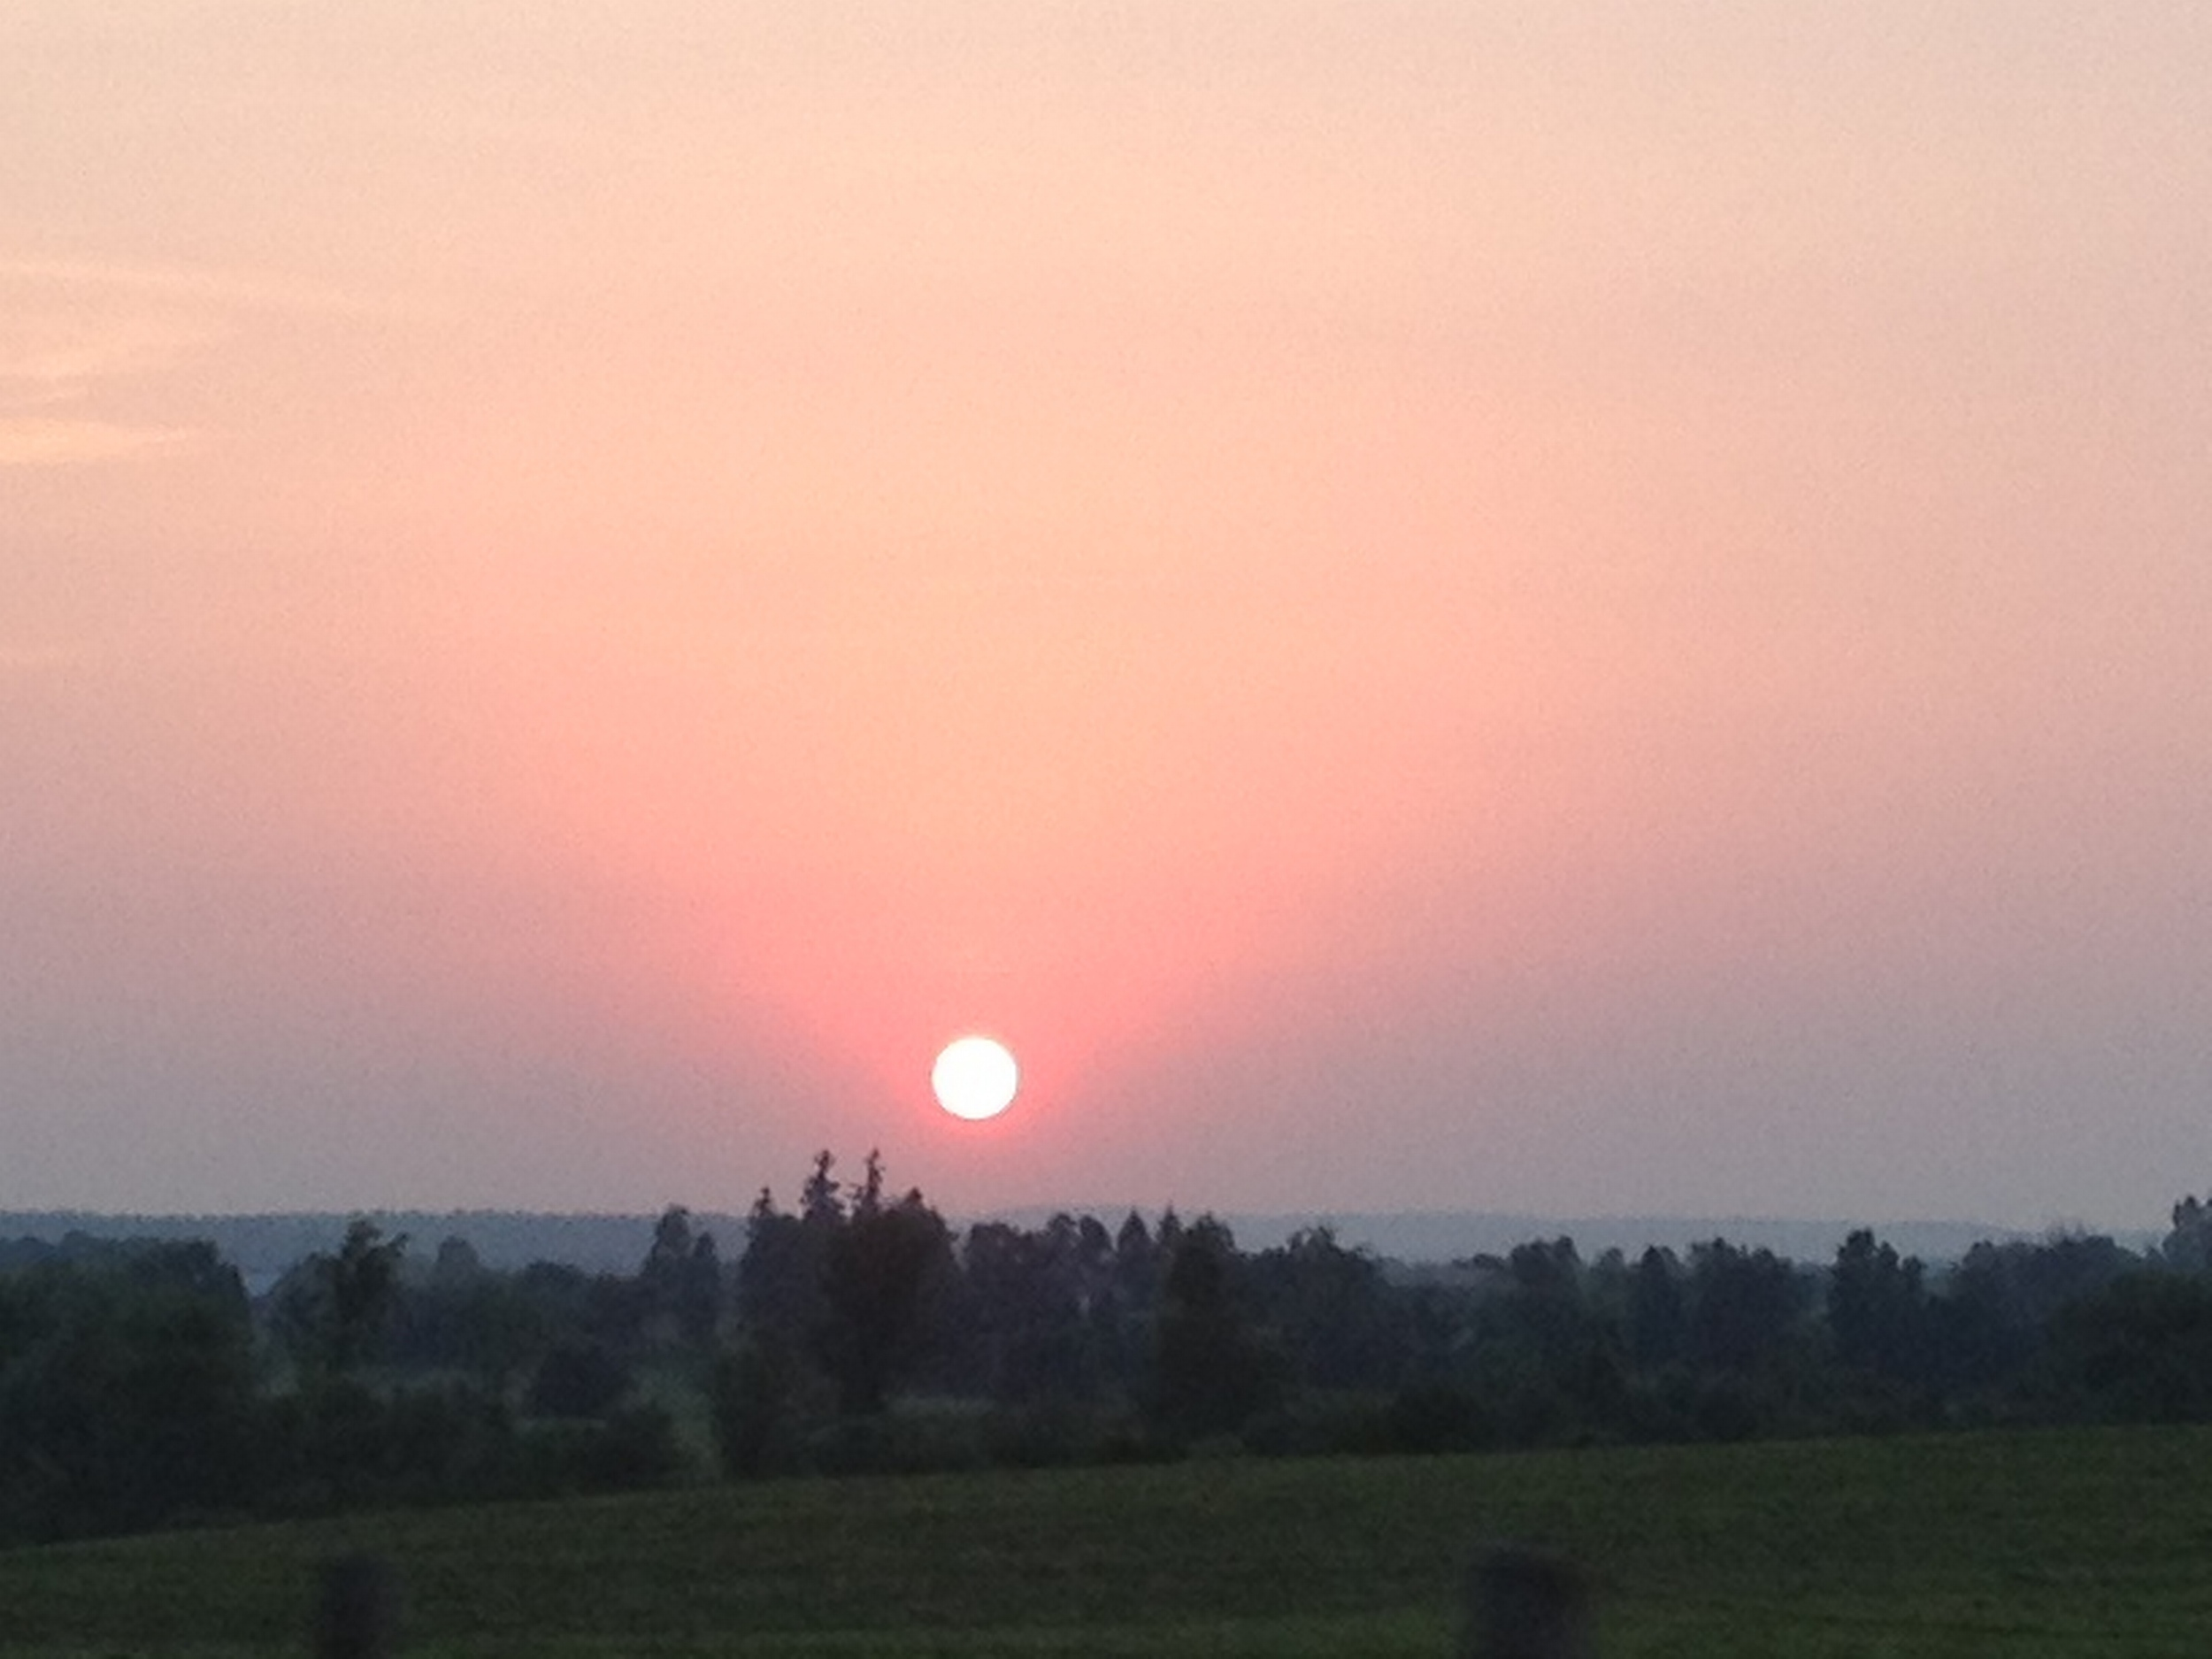 A rural Ontario summer sunset